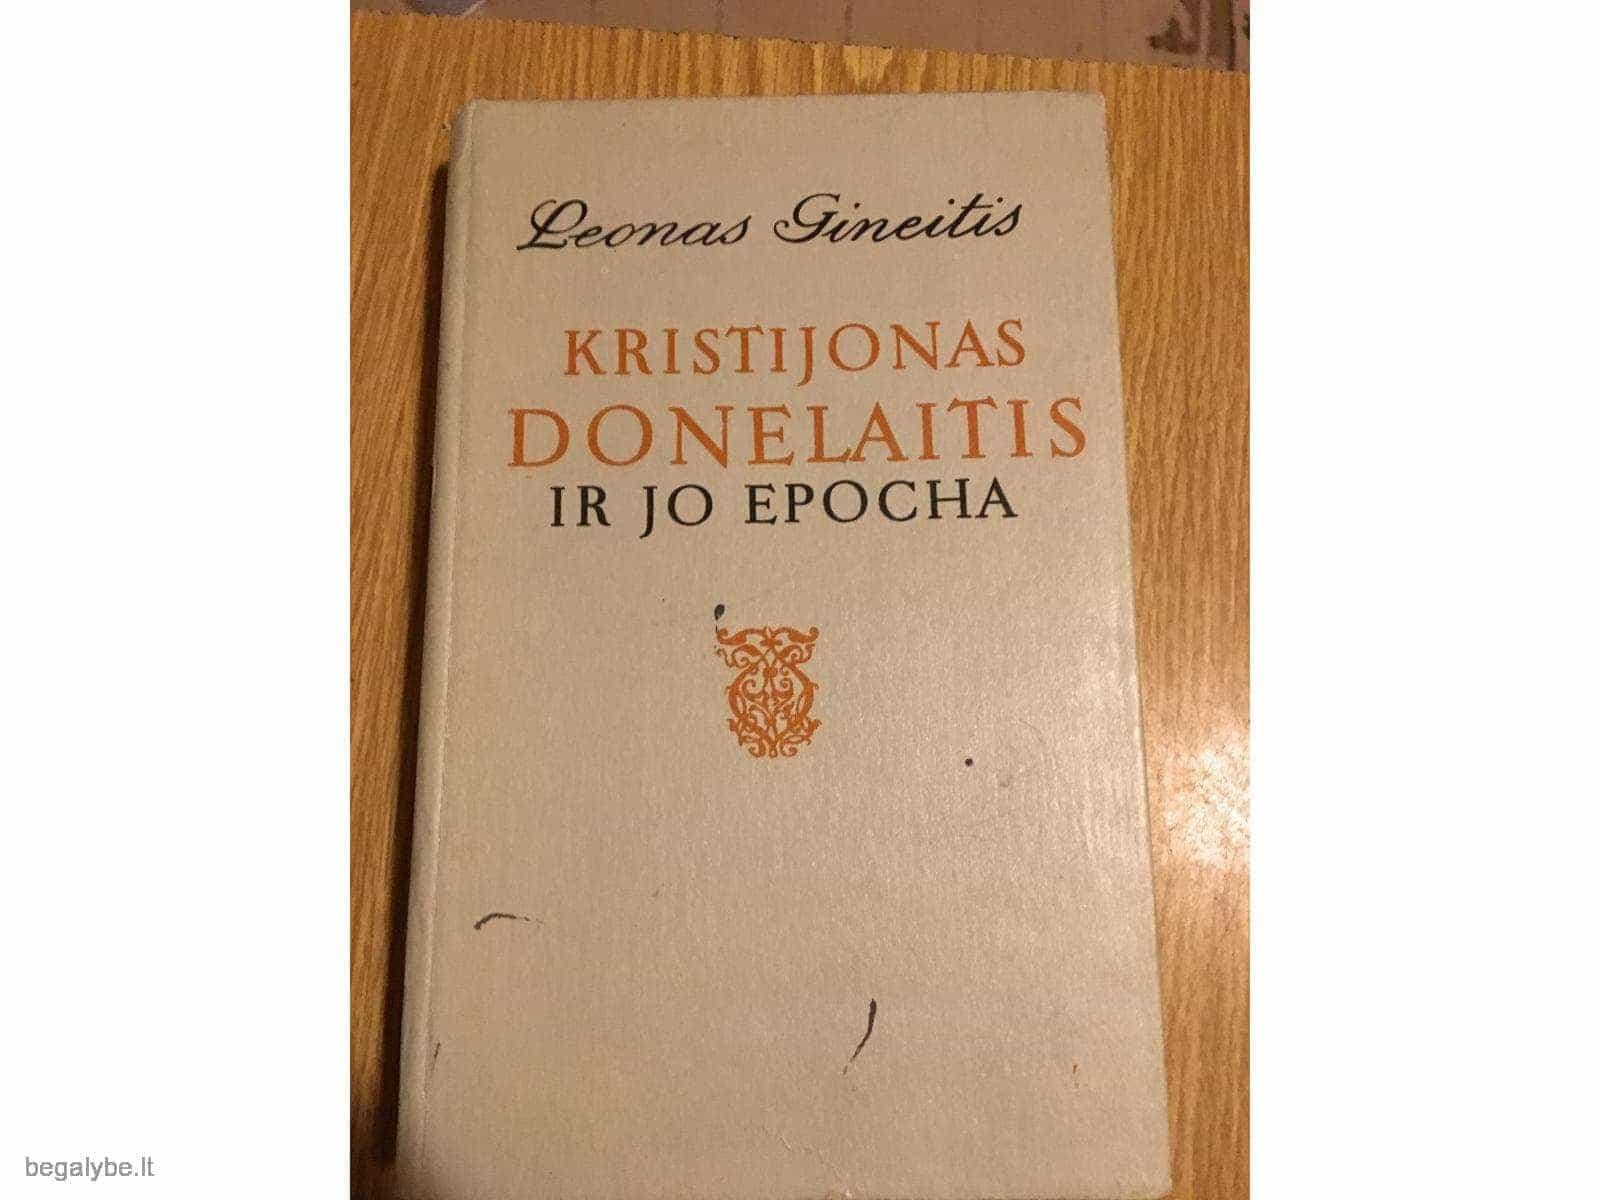 Leonas  Gineitis  - Kristijonas Donelaitis ir jo epocha